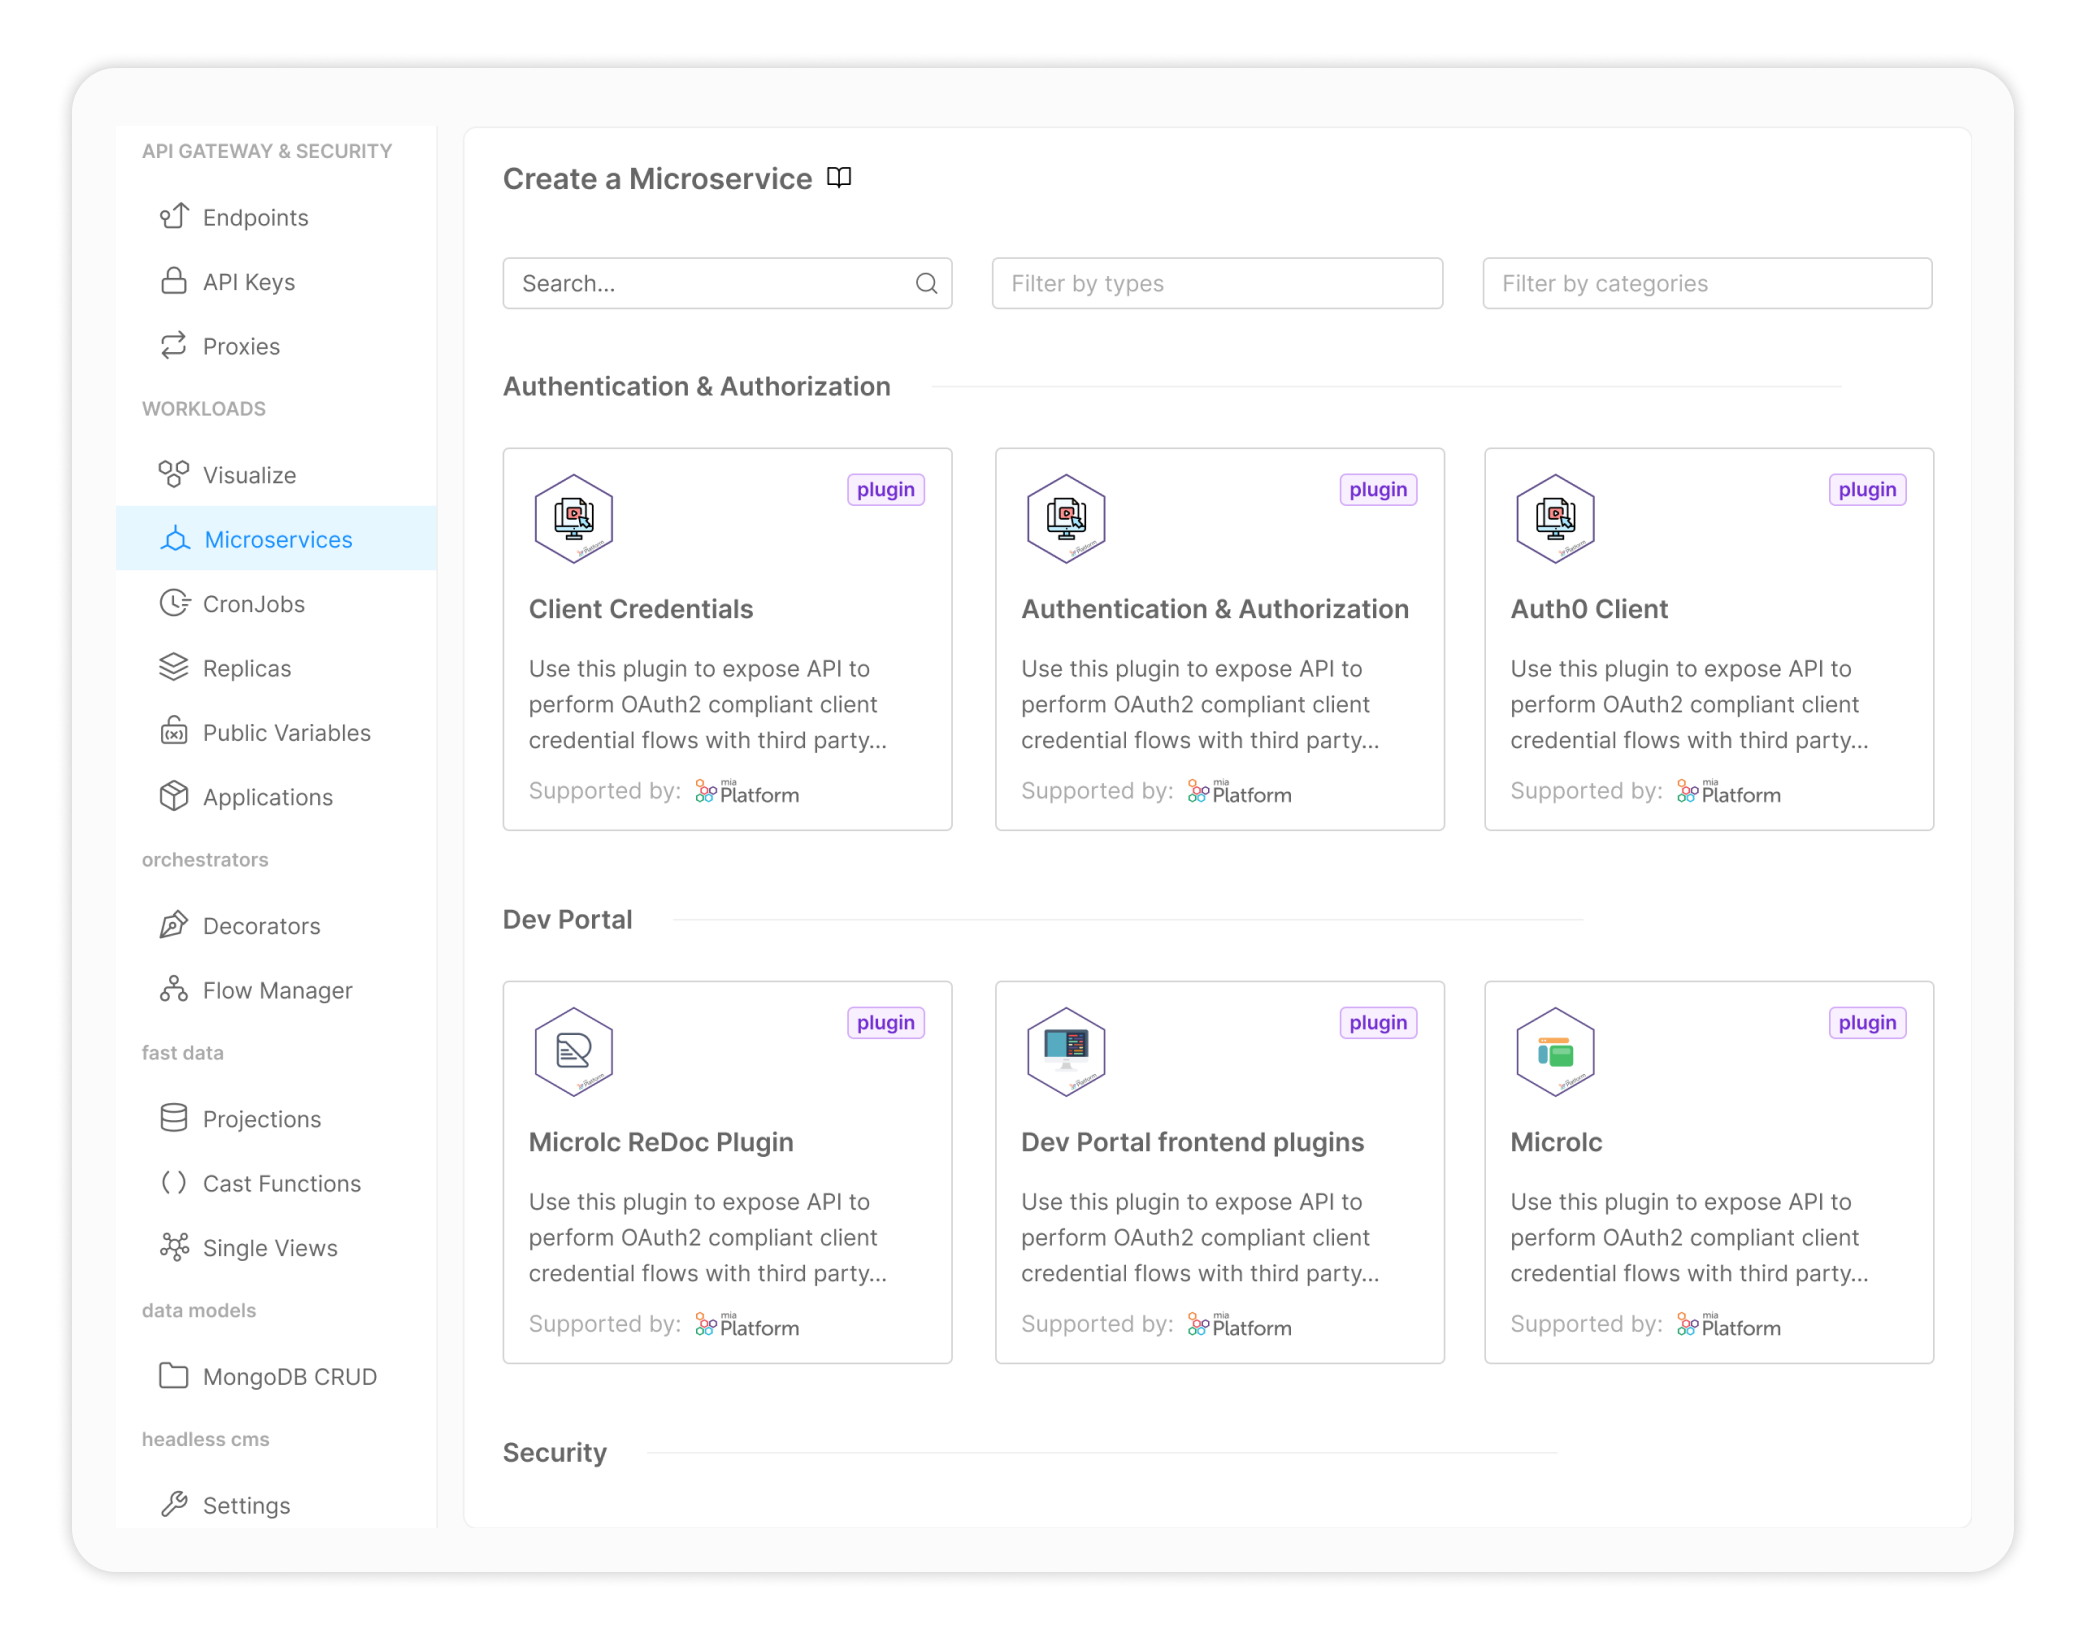 mia-platform-microservice-ready-to-use